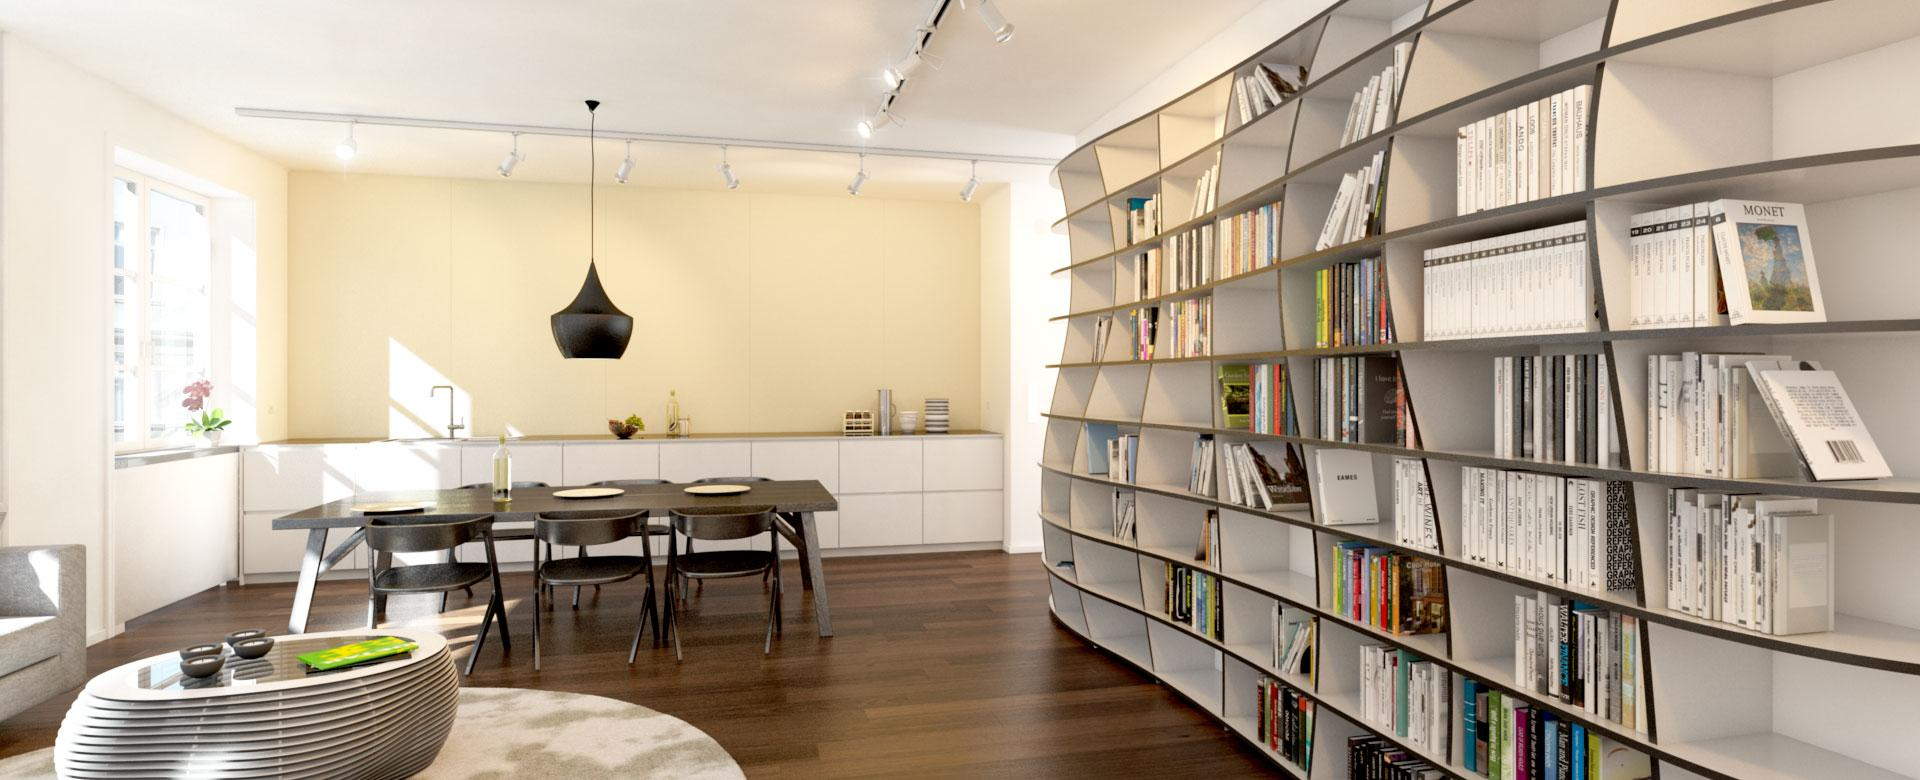 designerm bel bilder ideen couchstyle. Black Bedroom Furniture Sets. Home Design Ideas